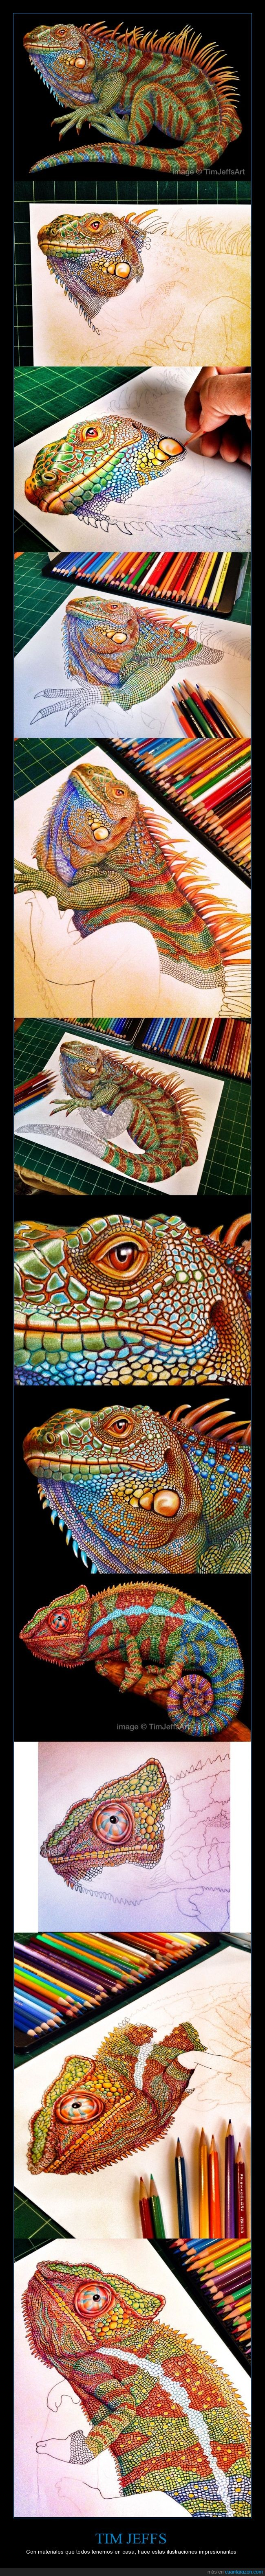 camaleon,color,dibujo,ilustracion,lagarto,madera,Tim Jeffs